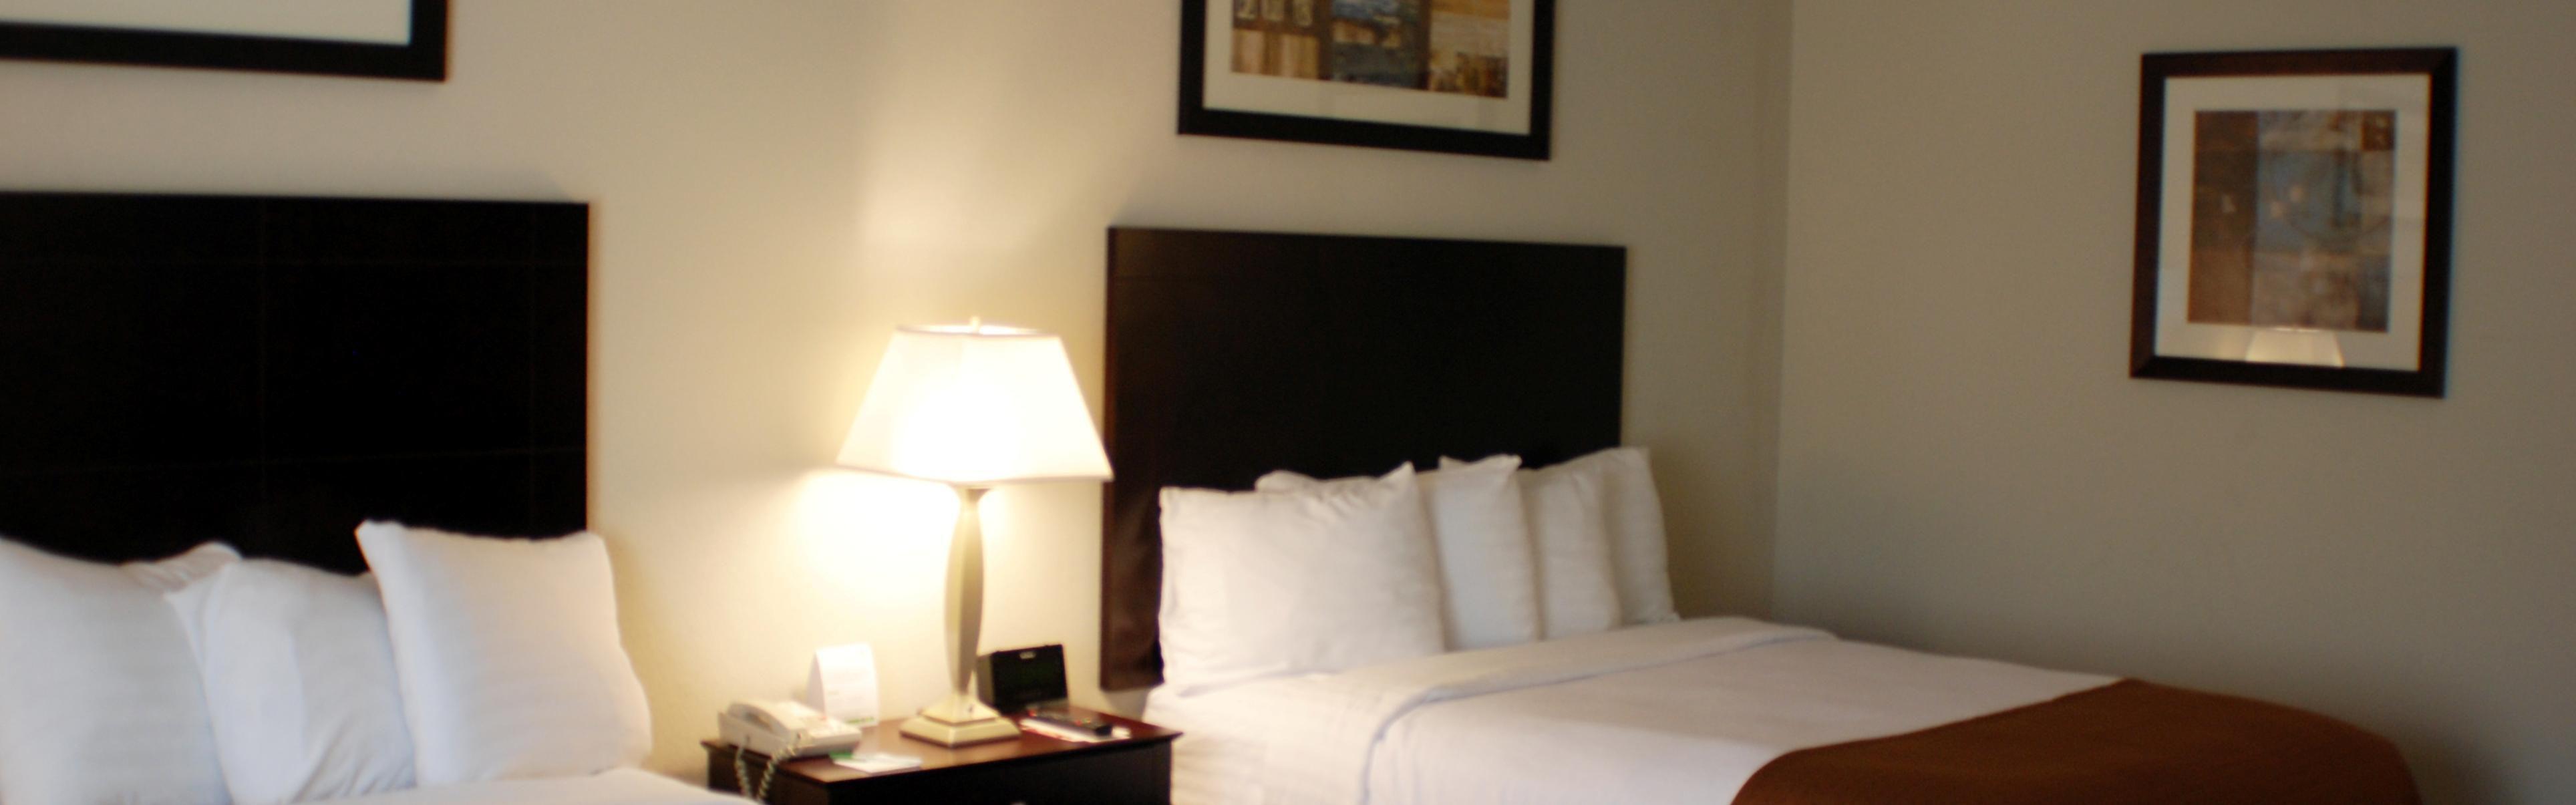 Holiday Inn Berkshires image 1